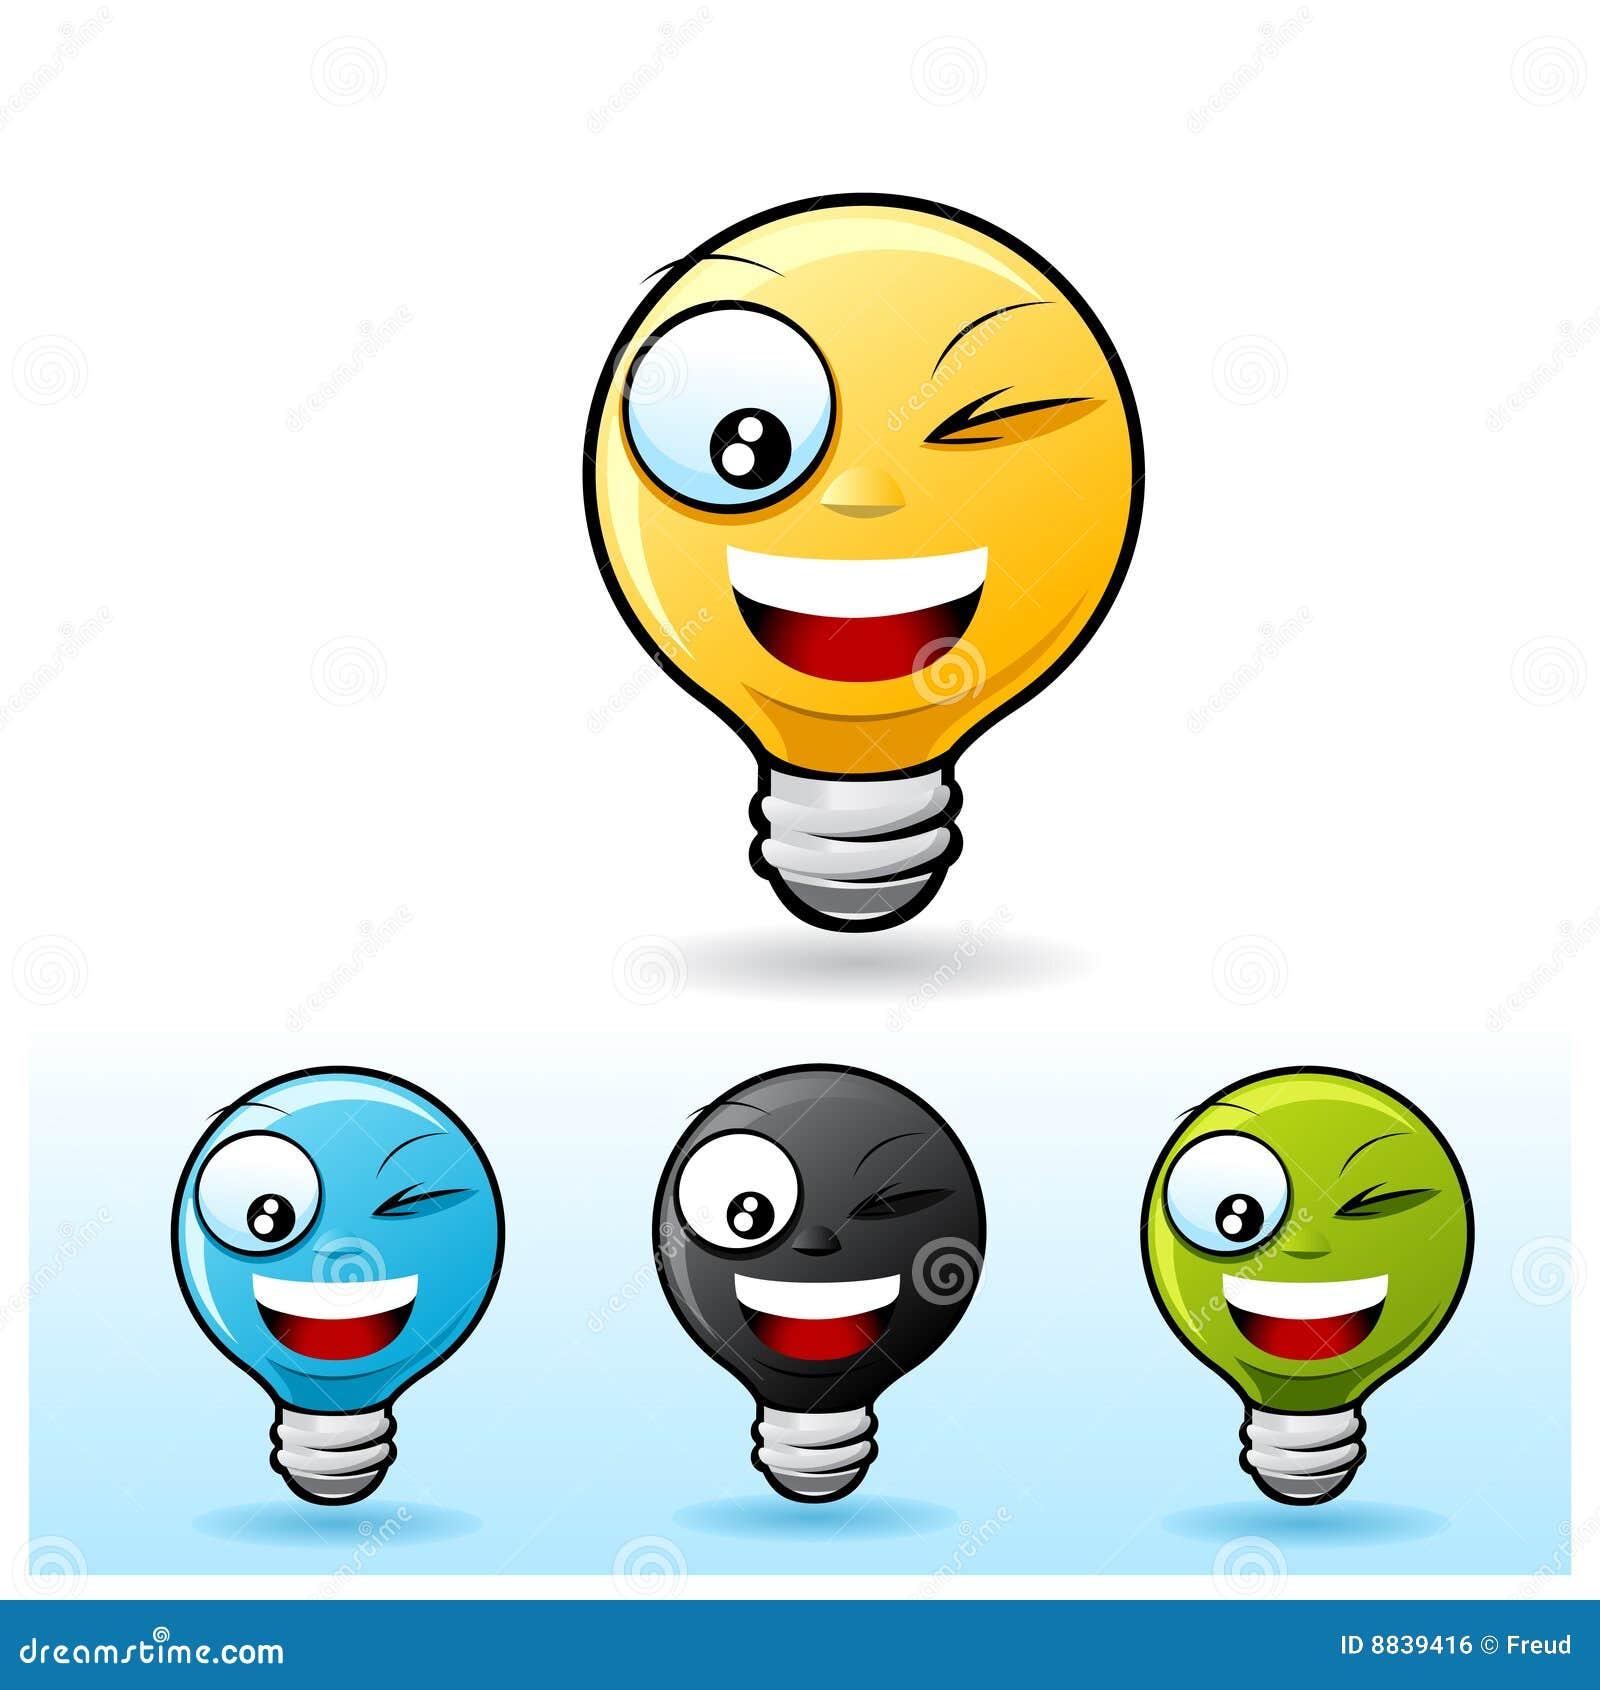 Light Bulb Character: Blinking Royalty Free Stock Image - Image ...:Light bulb character: Blinking,Lighting